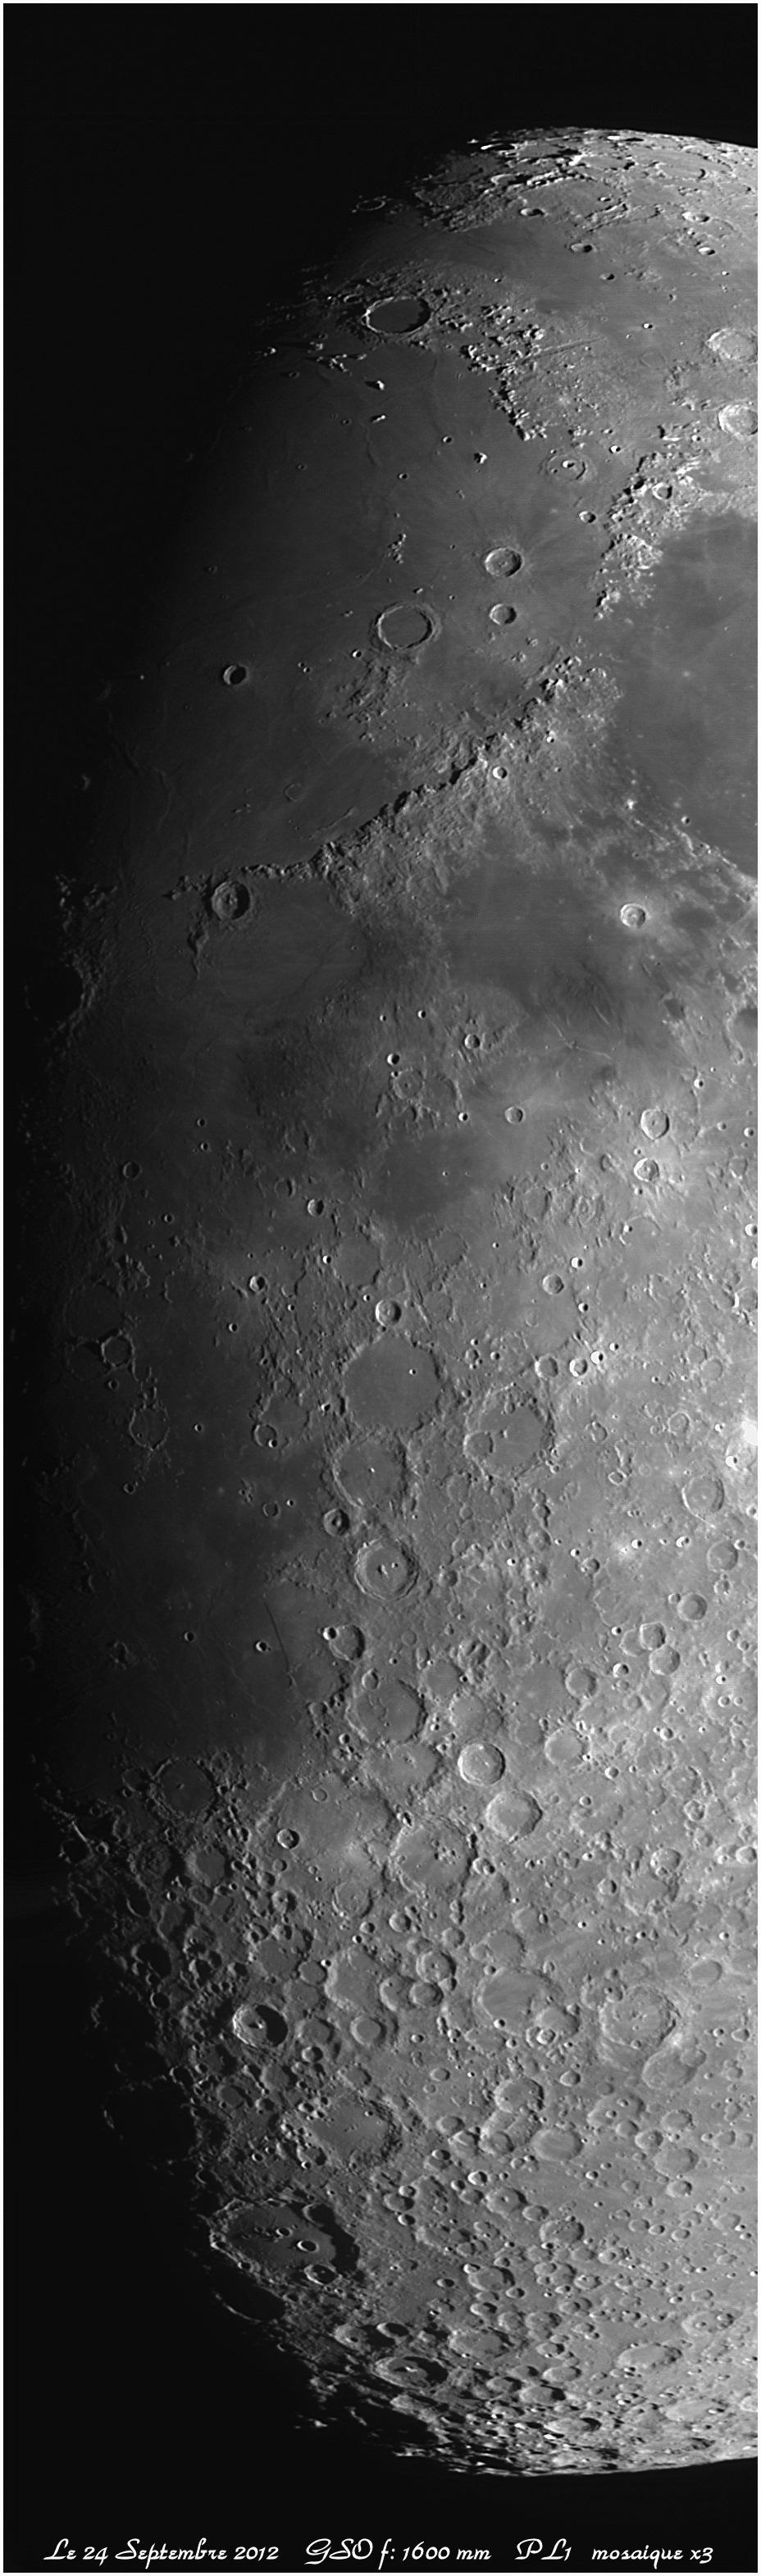 http://www.astrosurf.com/micastro/images/Lune%20PL1.jpg